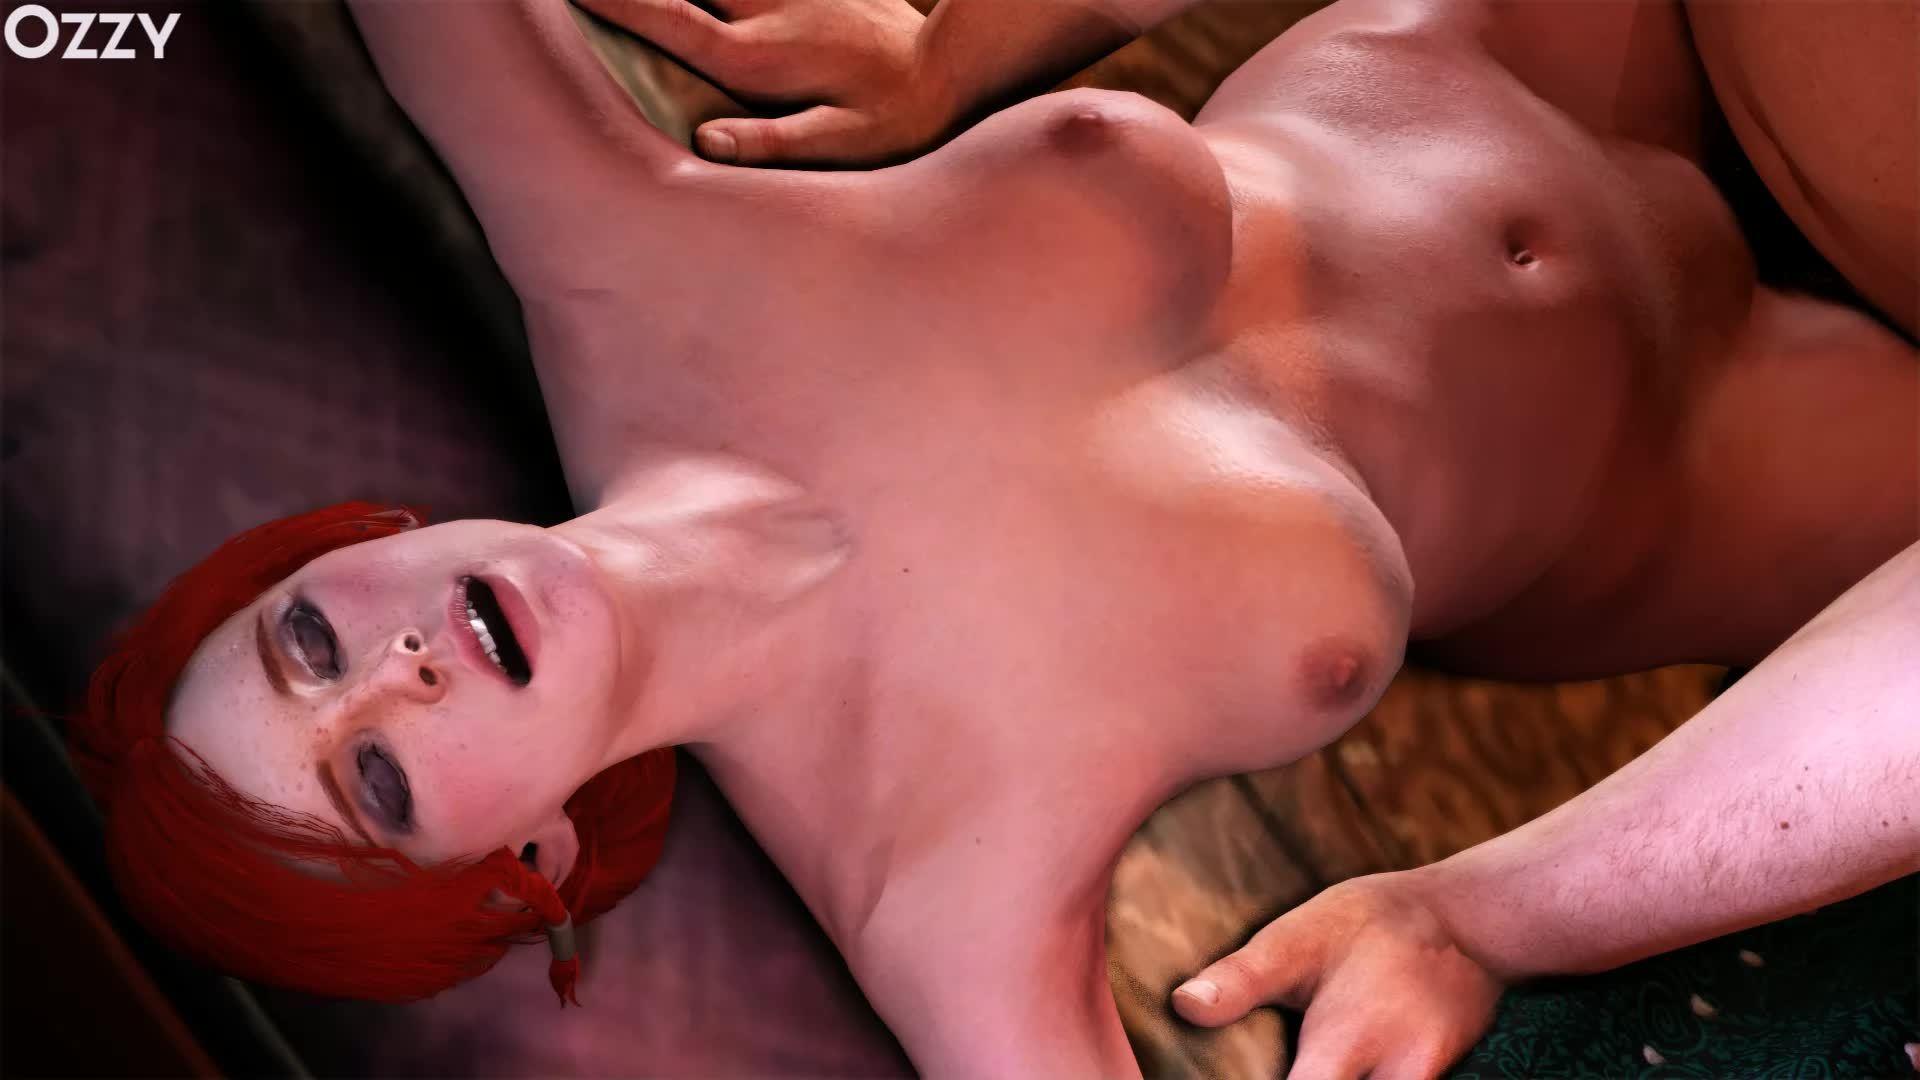 Nude human mermade pic hentai amateur girl